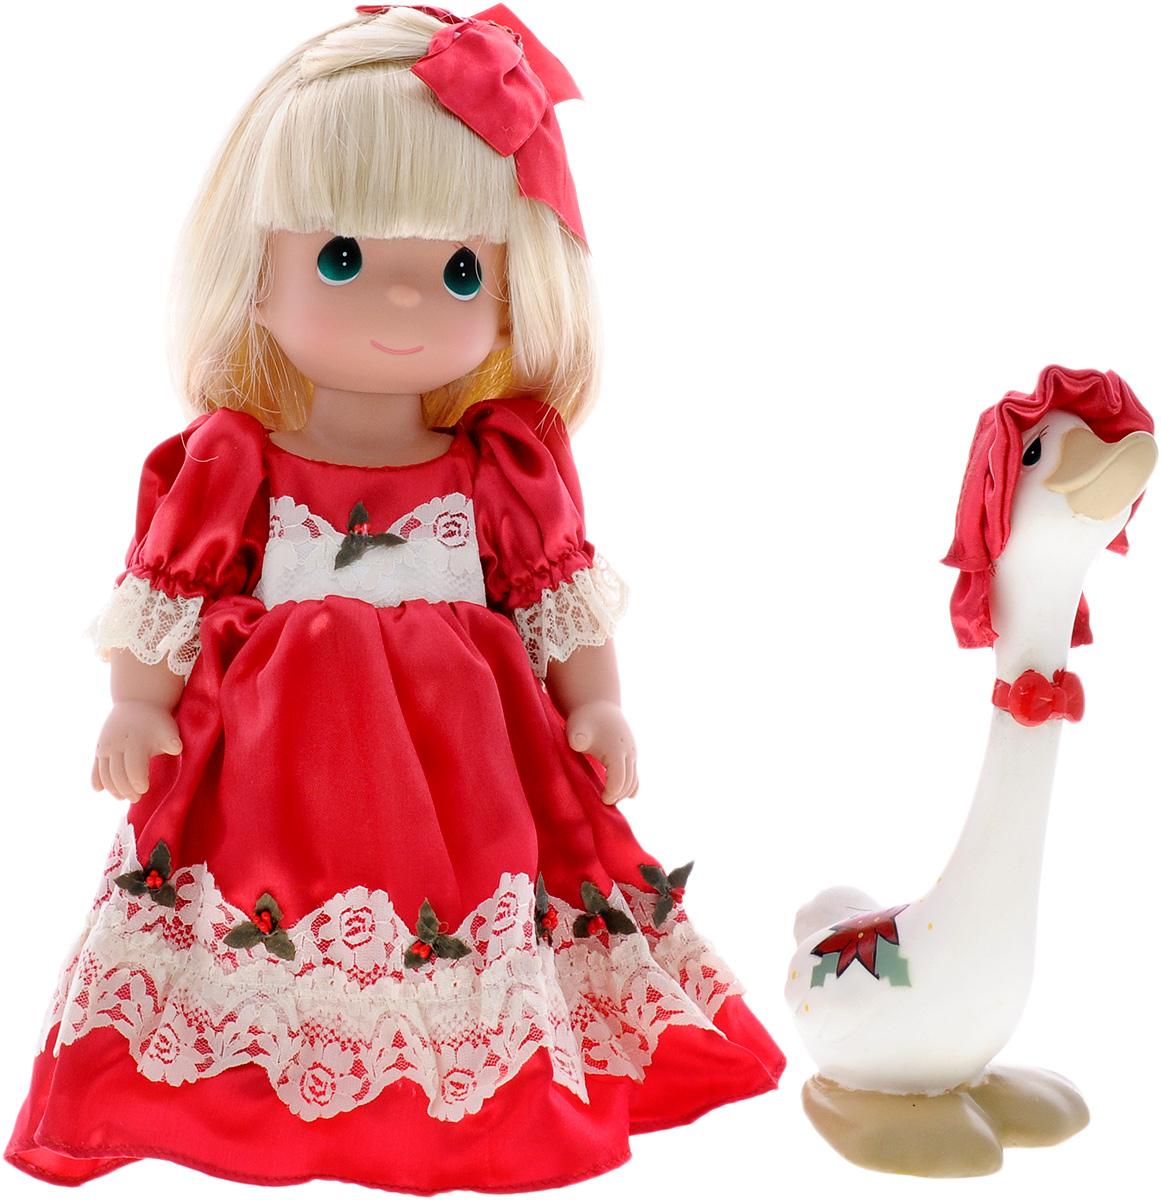 Precious Moments Кукла Рождество куклы и одежда для кукол precious кукла балерина рыжая 30 см